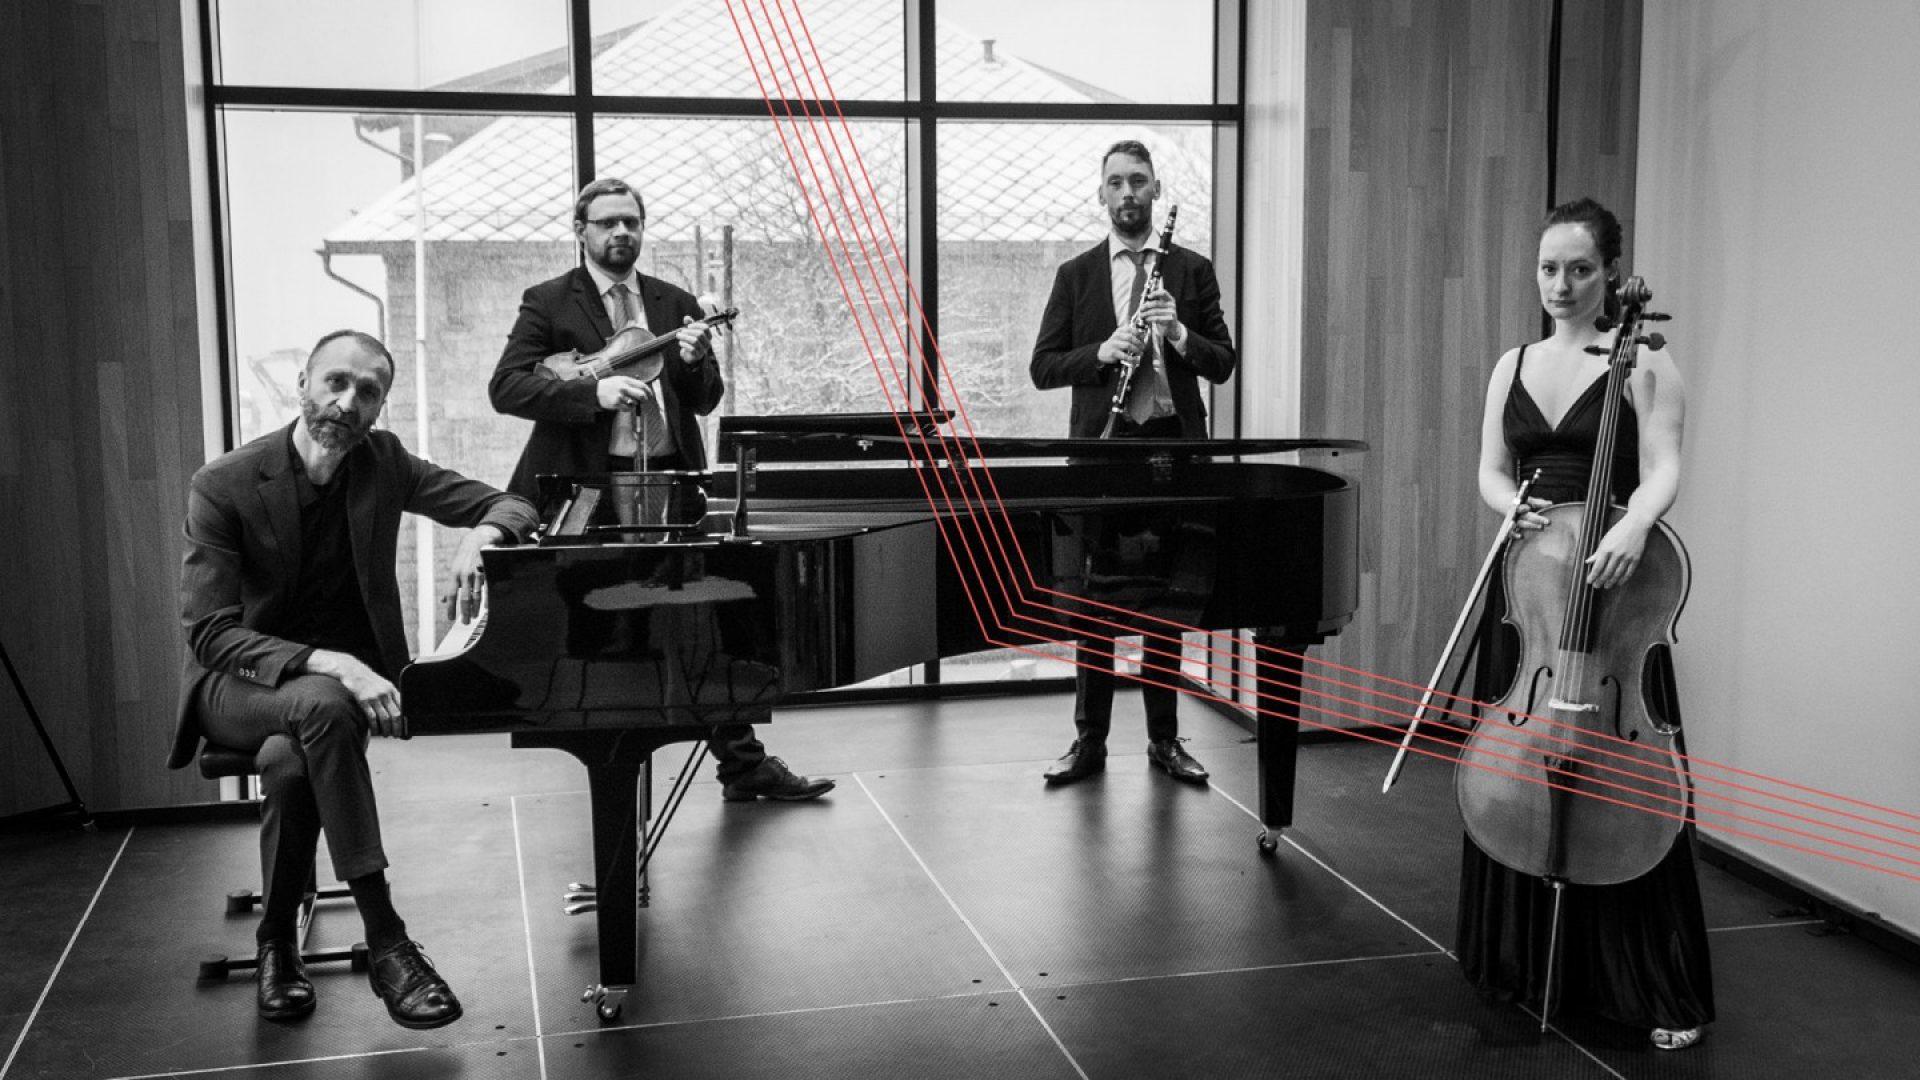 musikere rundt klaver i Stormen Konserthus